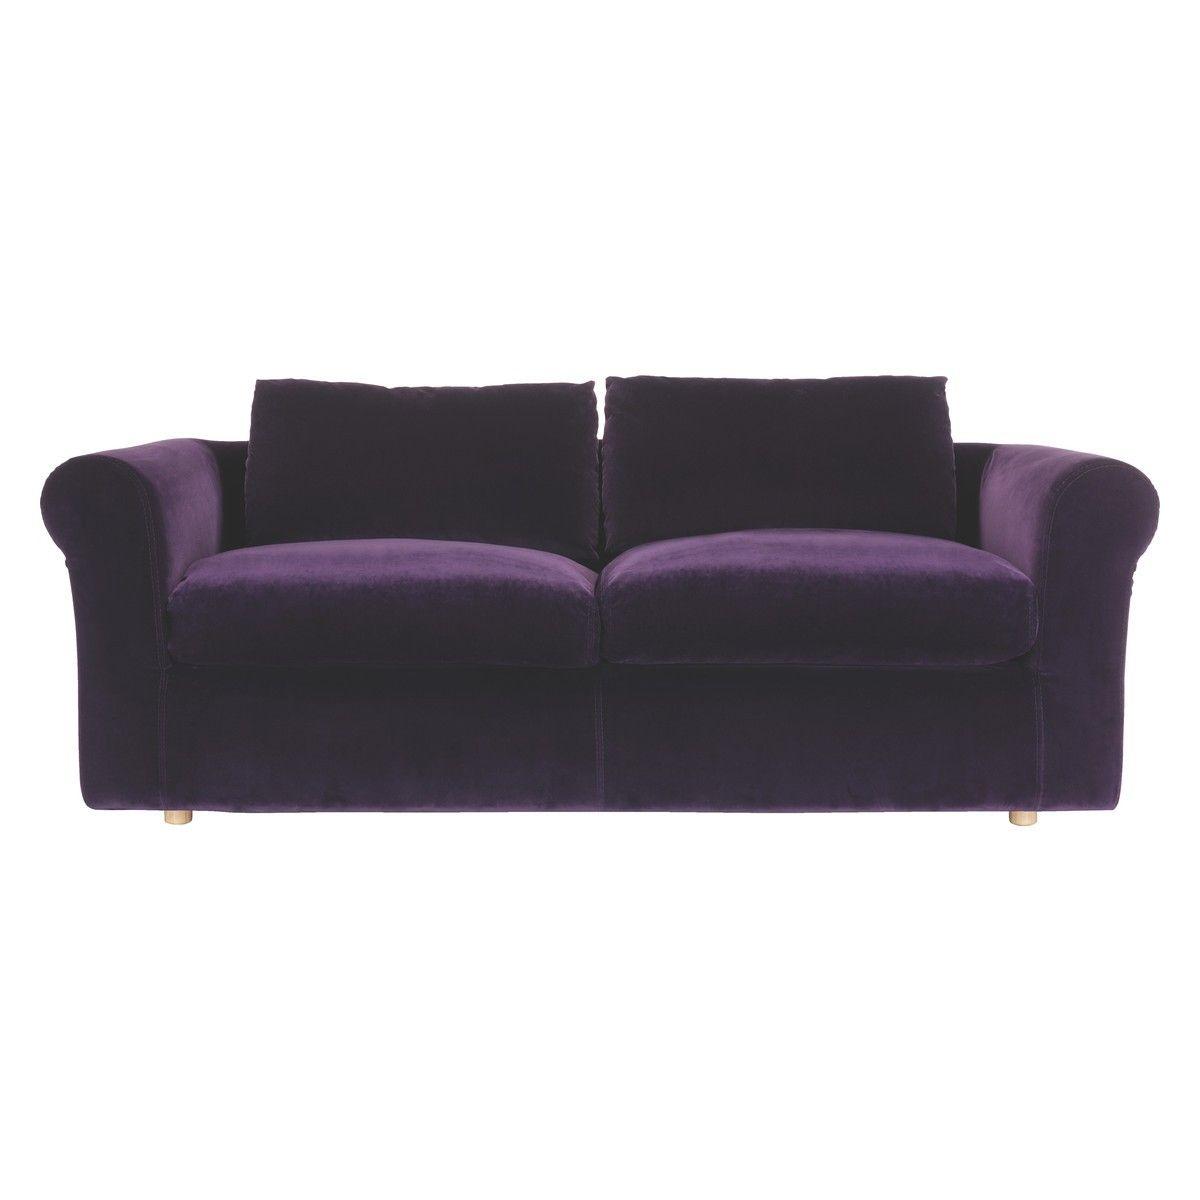 purple corner sofa bed standard size philippines velvet louis 3 seater